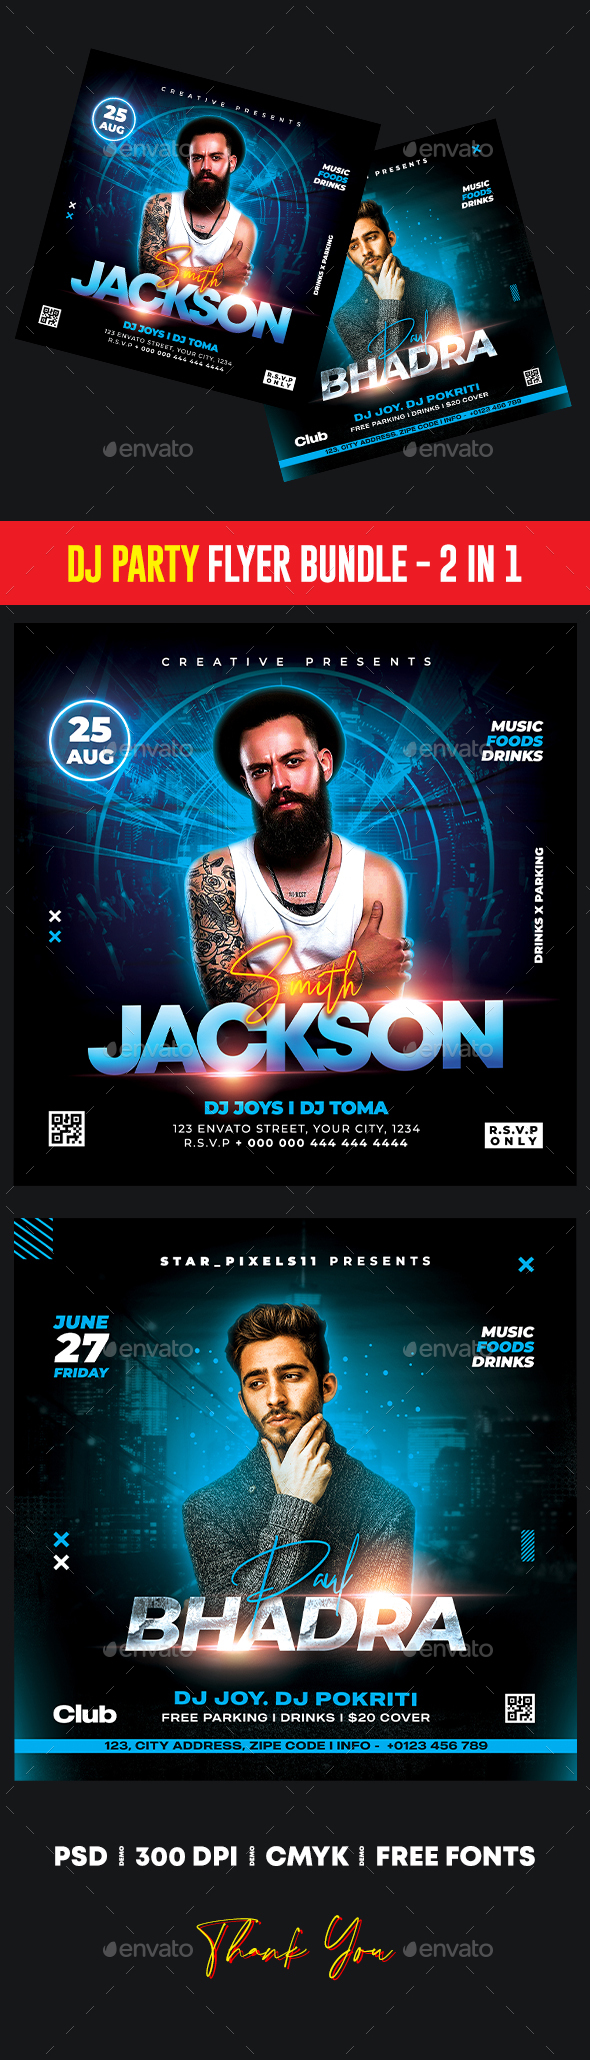 DJ Party Flyer Bundle